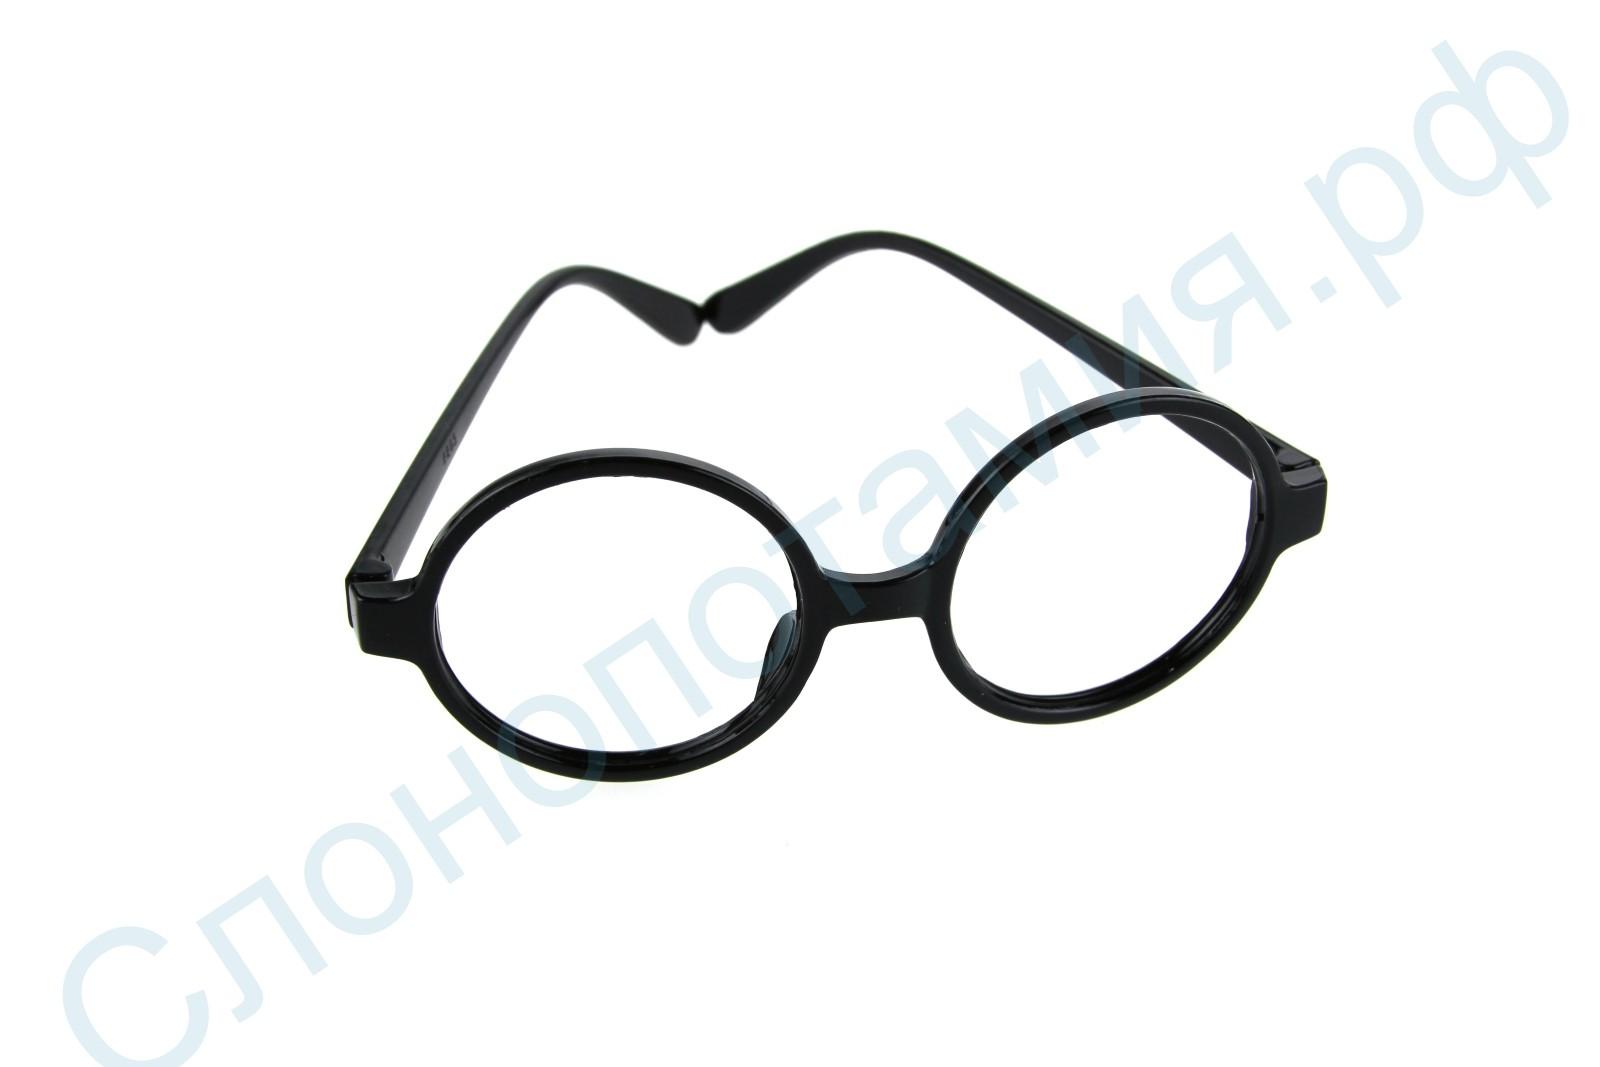 Очки Гарри Поттера пластиковые  ab25e7751a900